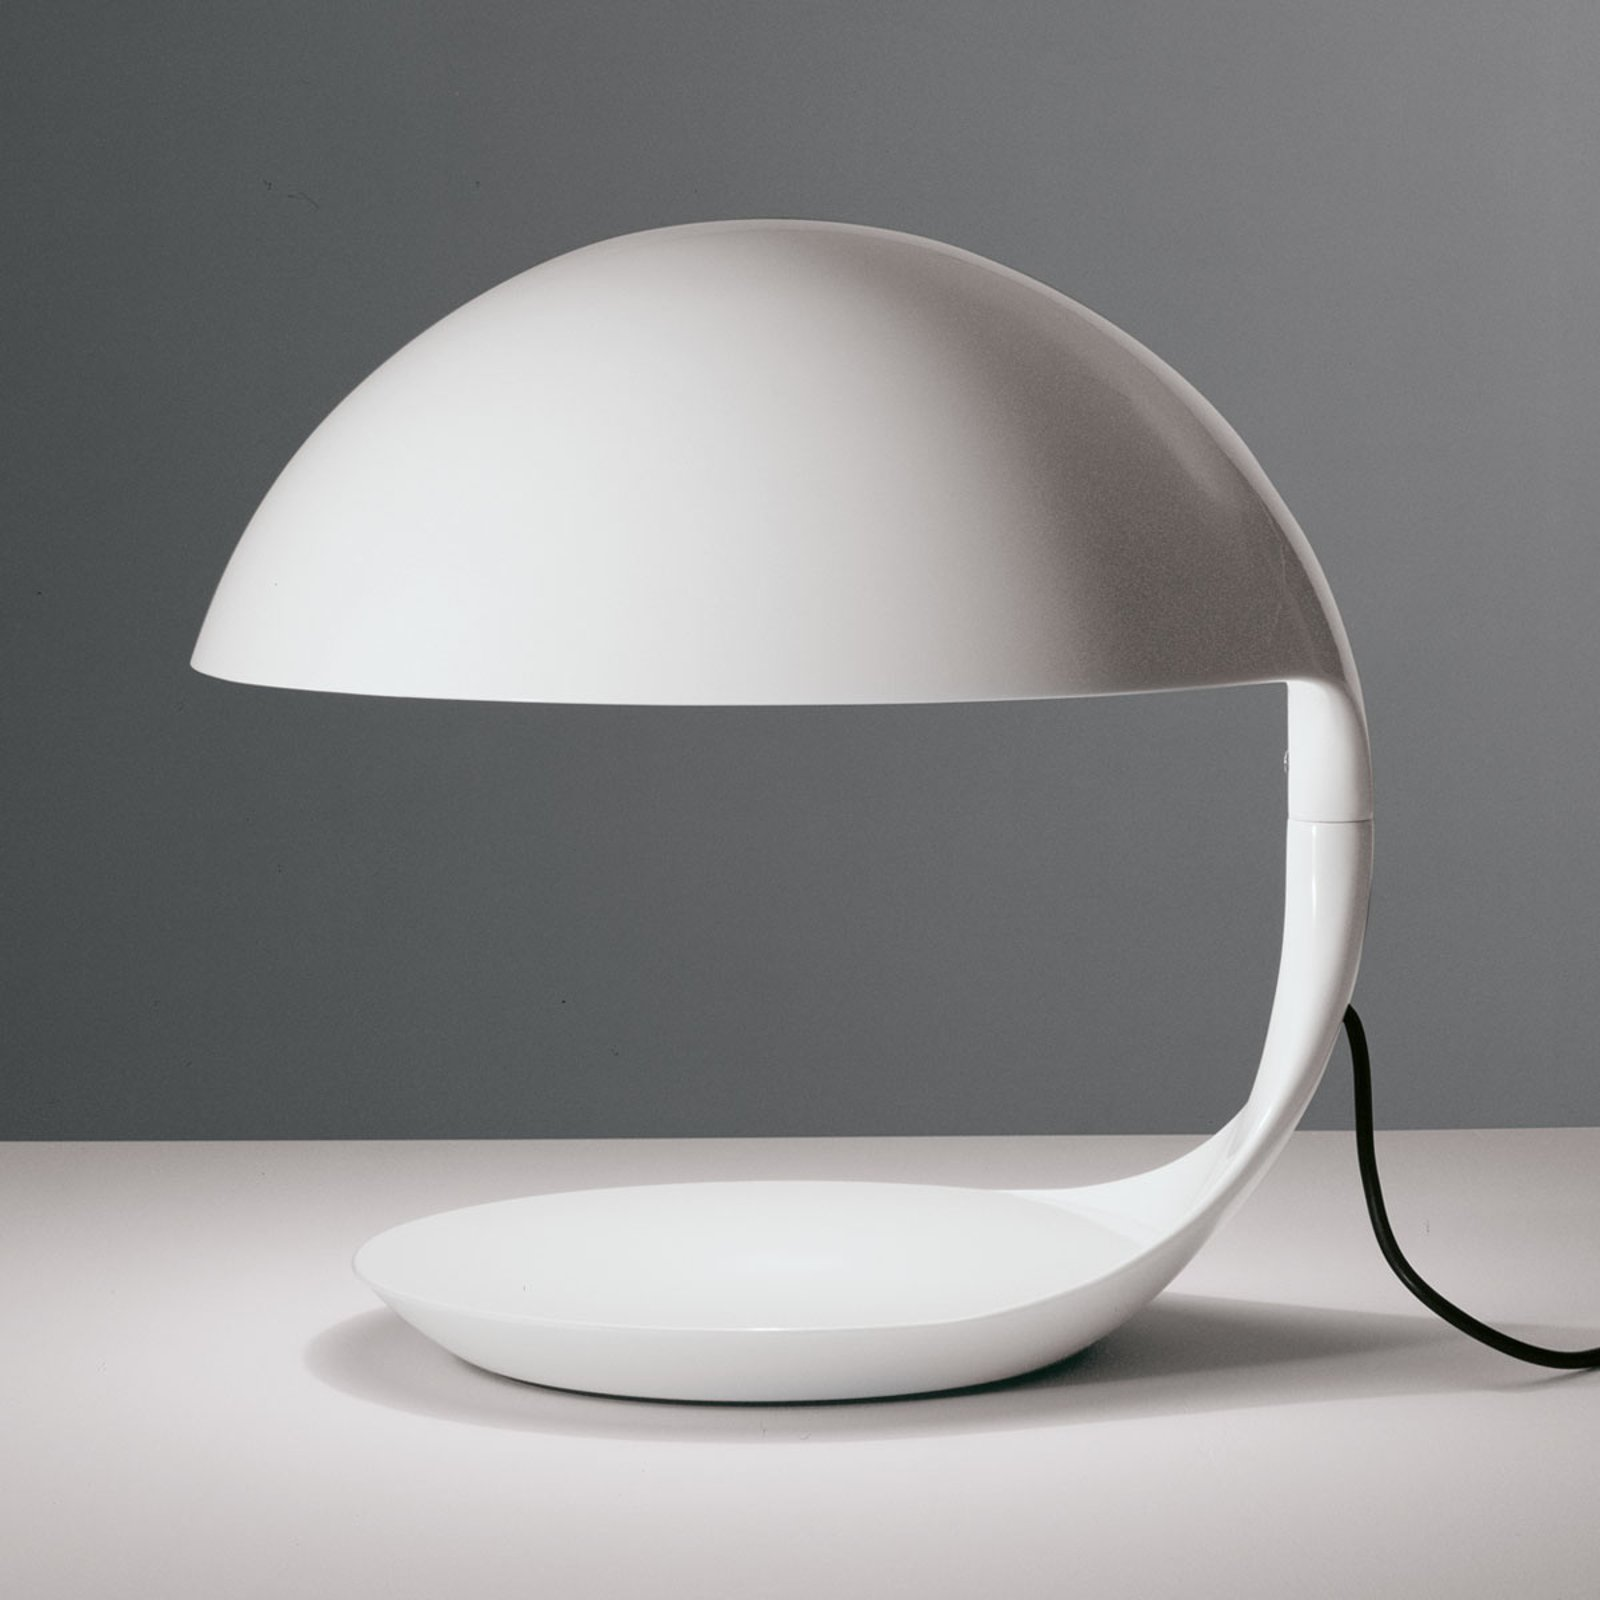 Retro-bordlampe COBRA